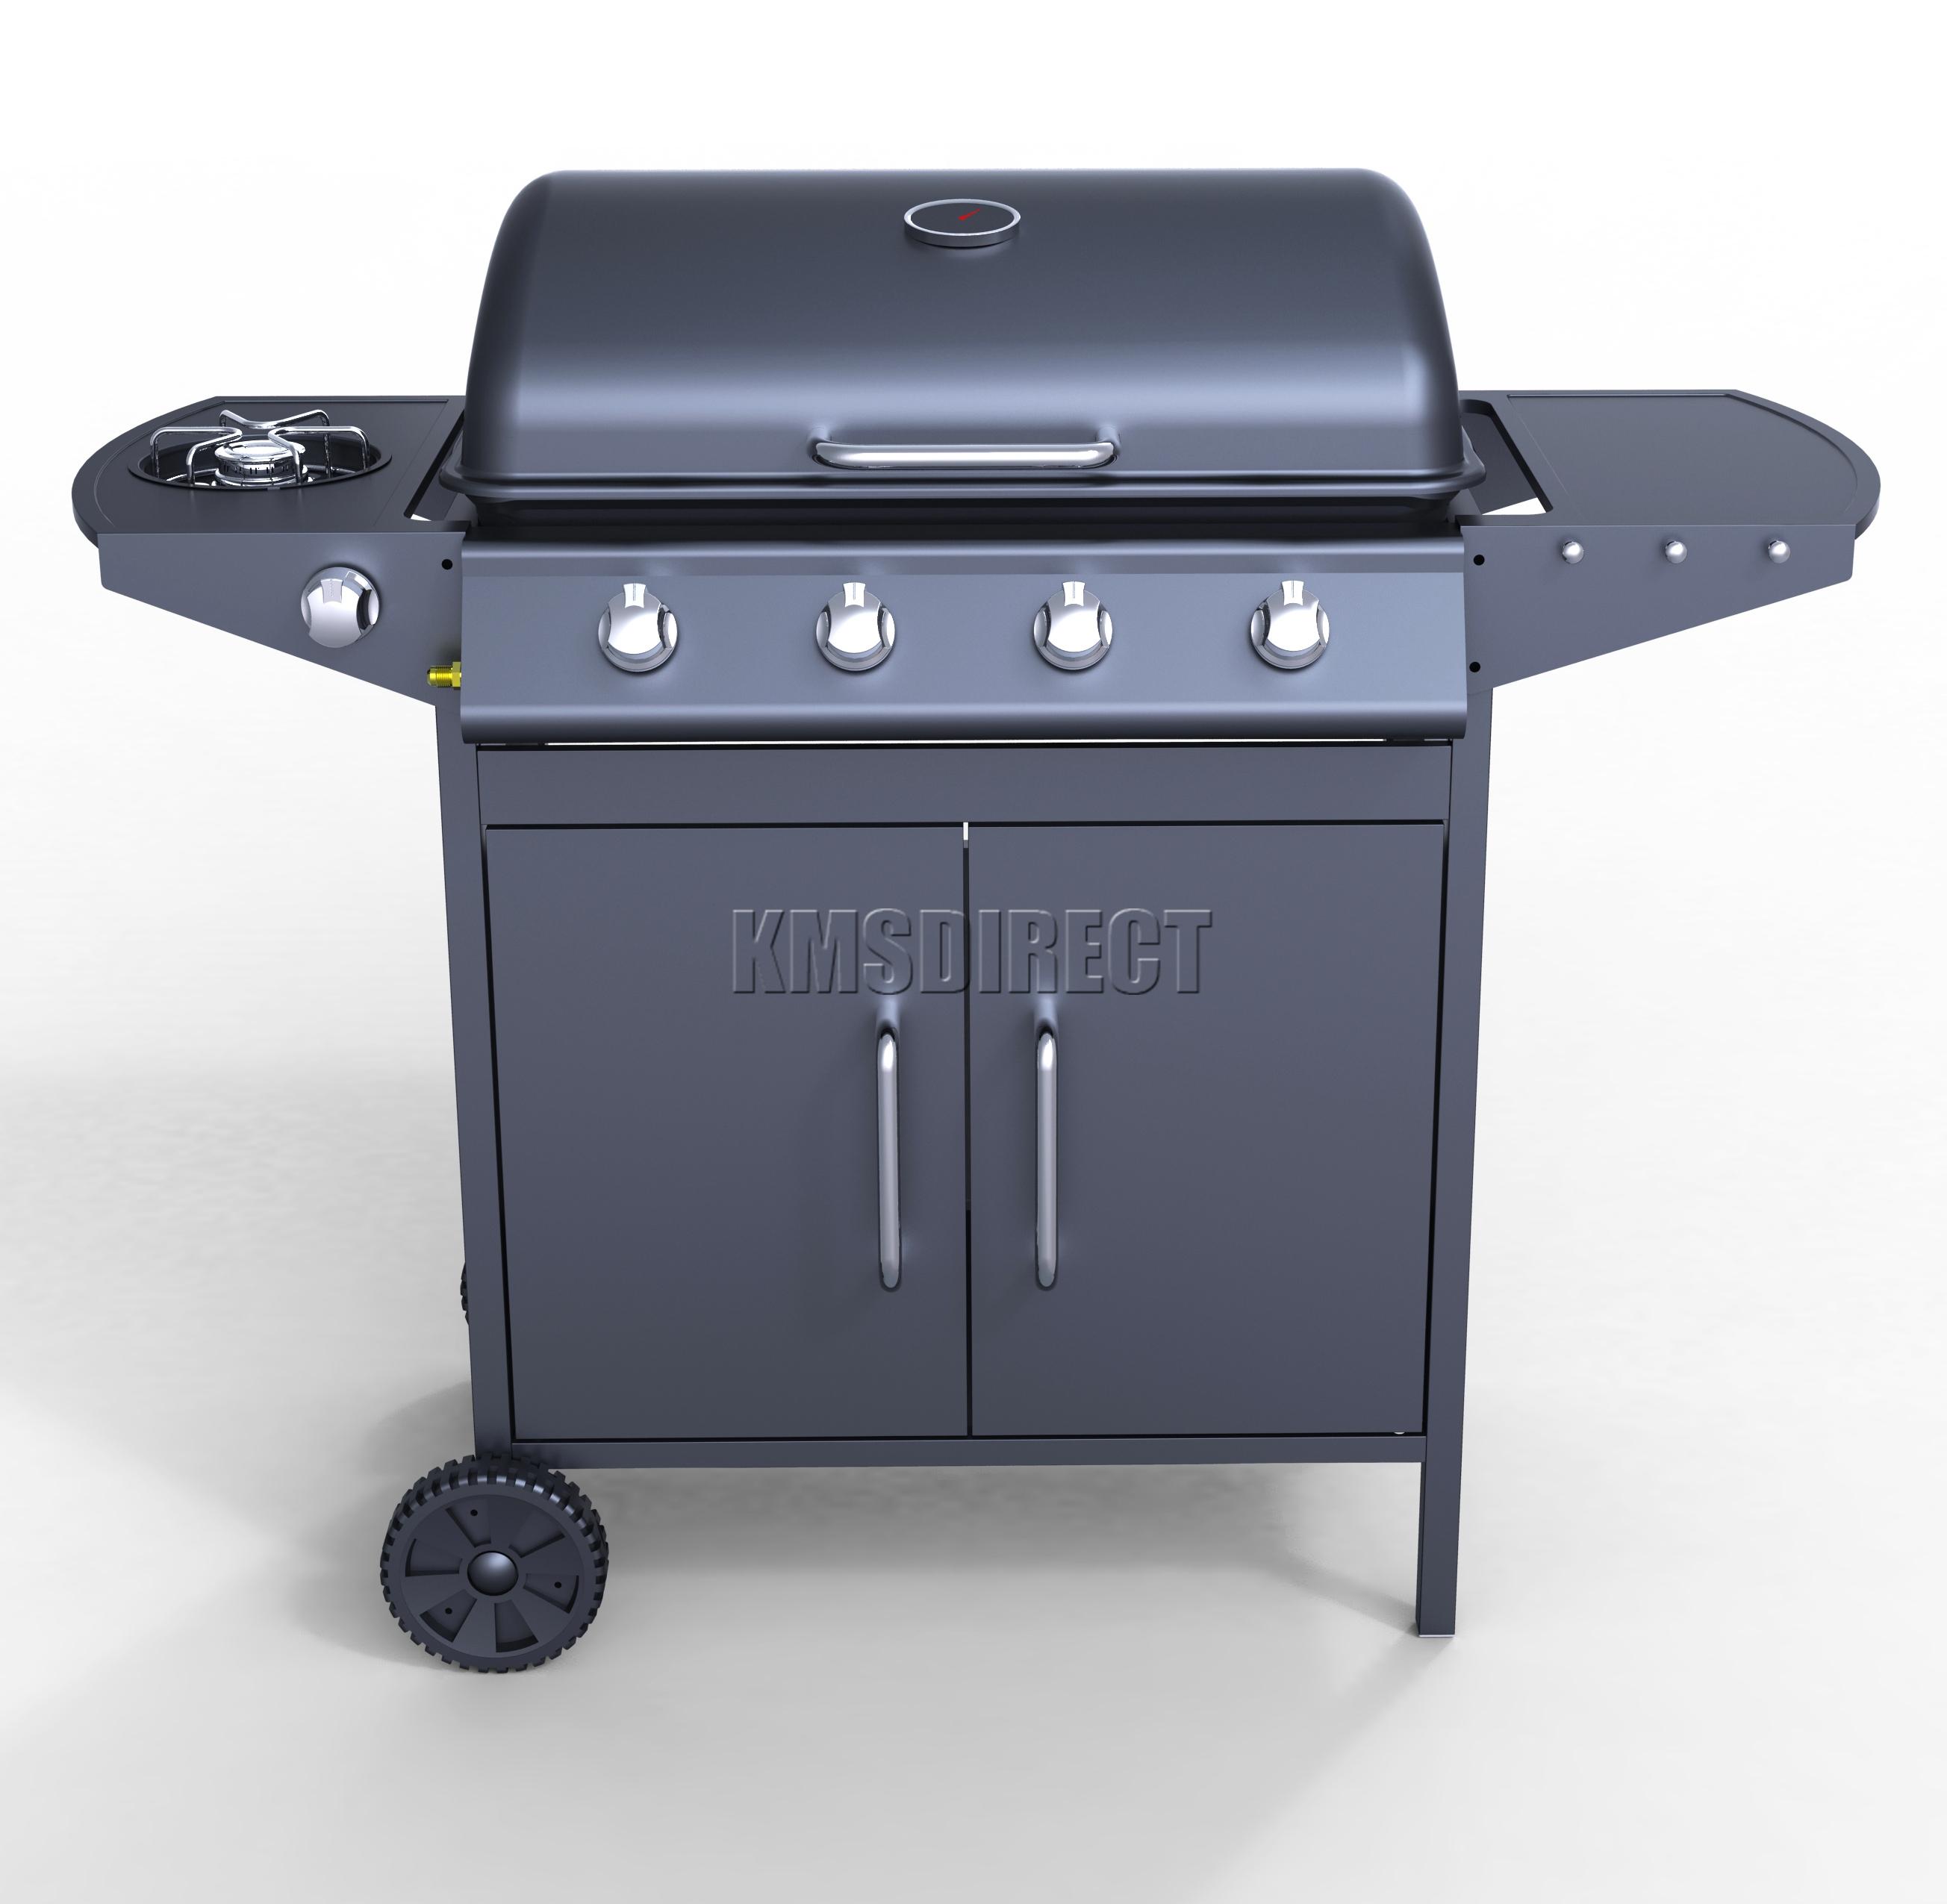 Foxhunter burner bbq gas grill black steel barbecue